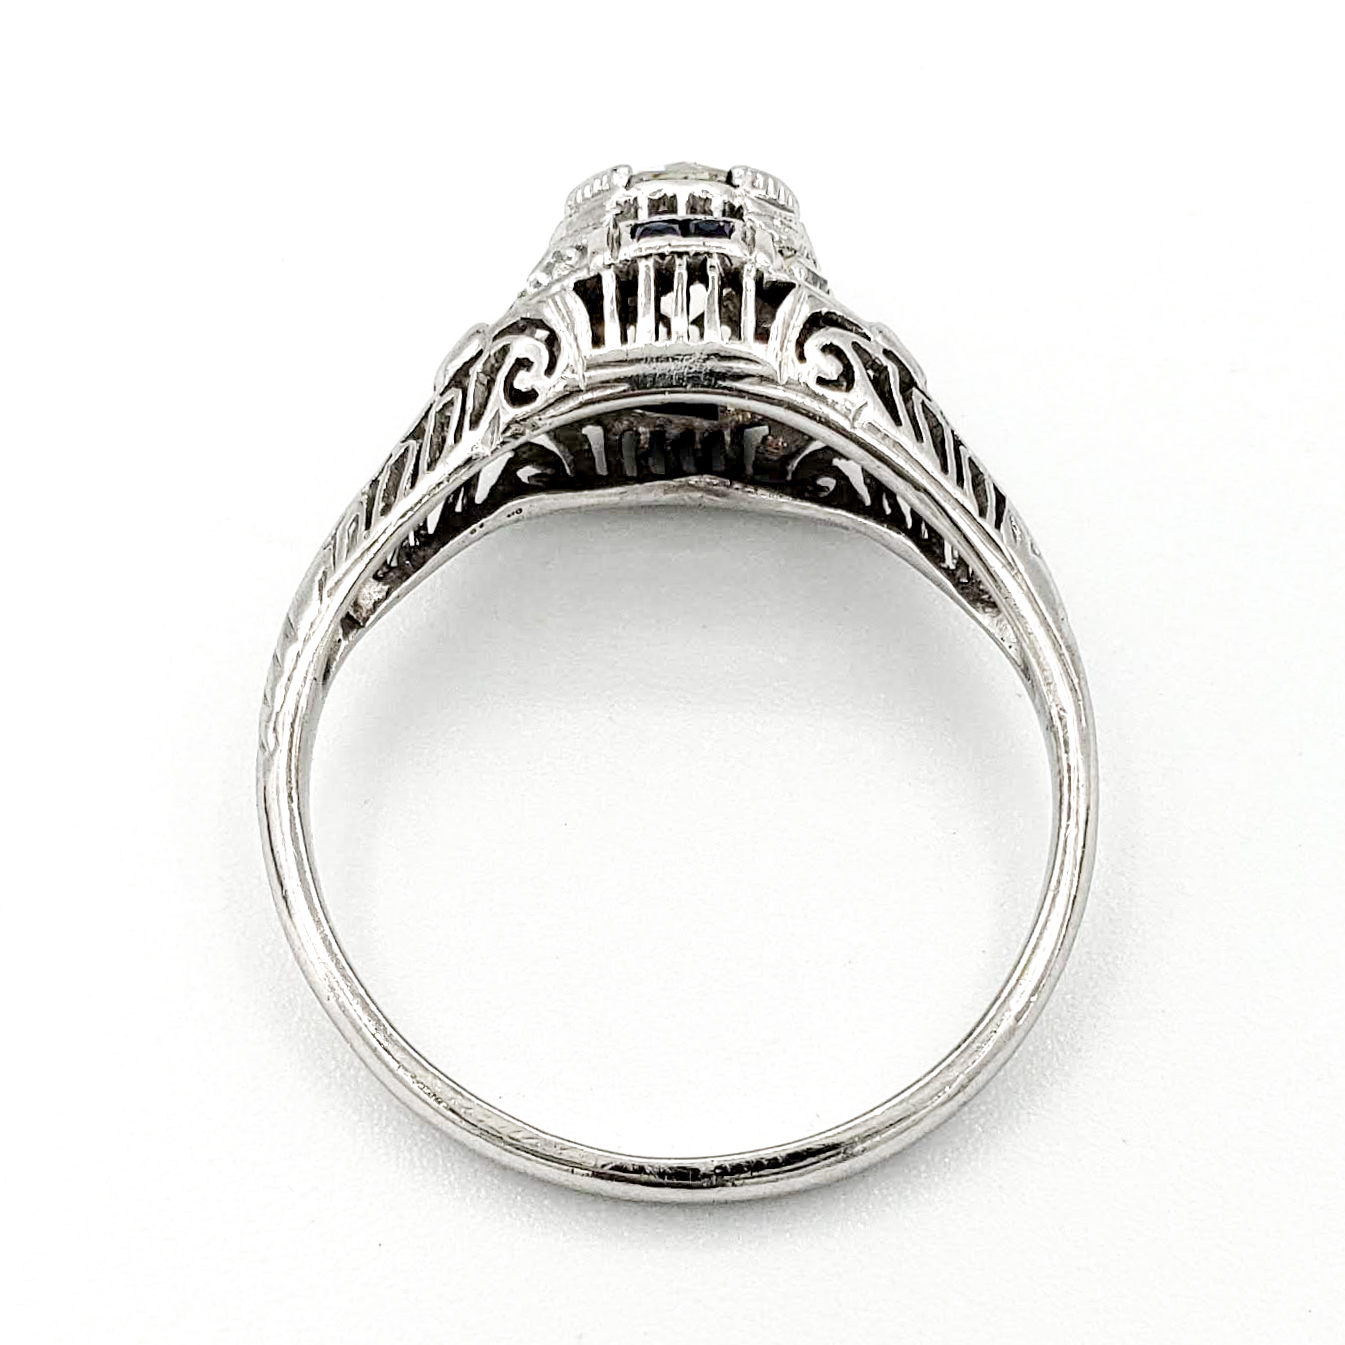 vintage-platinum-engagement-ring-with-0-73-carat-old-european-cut-diamond-egl-j-vs1